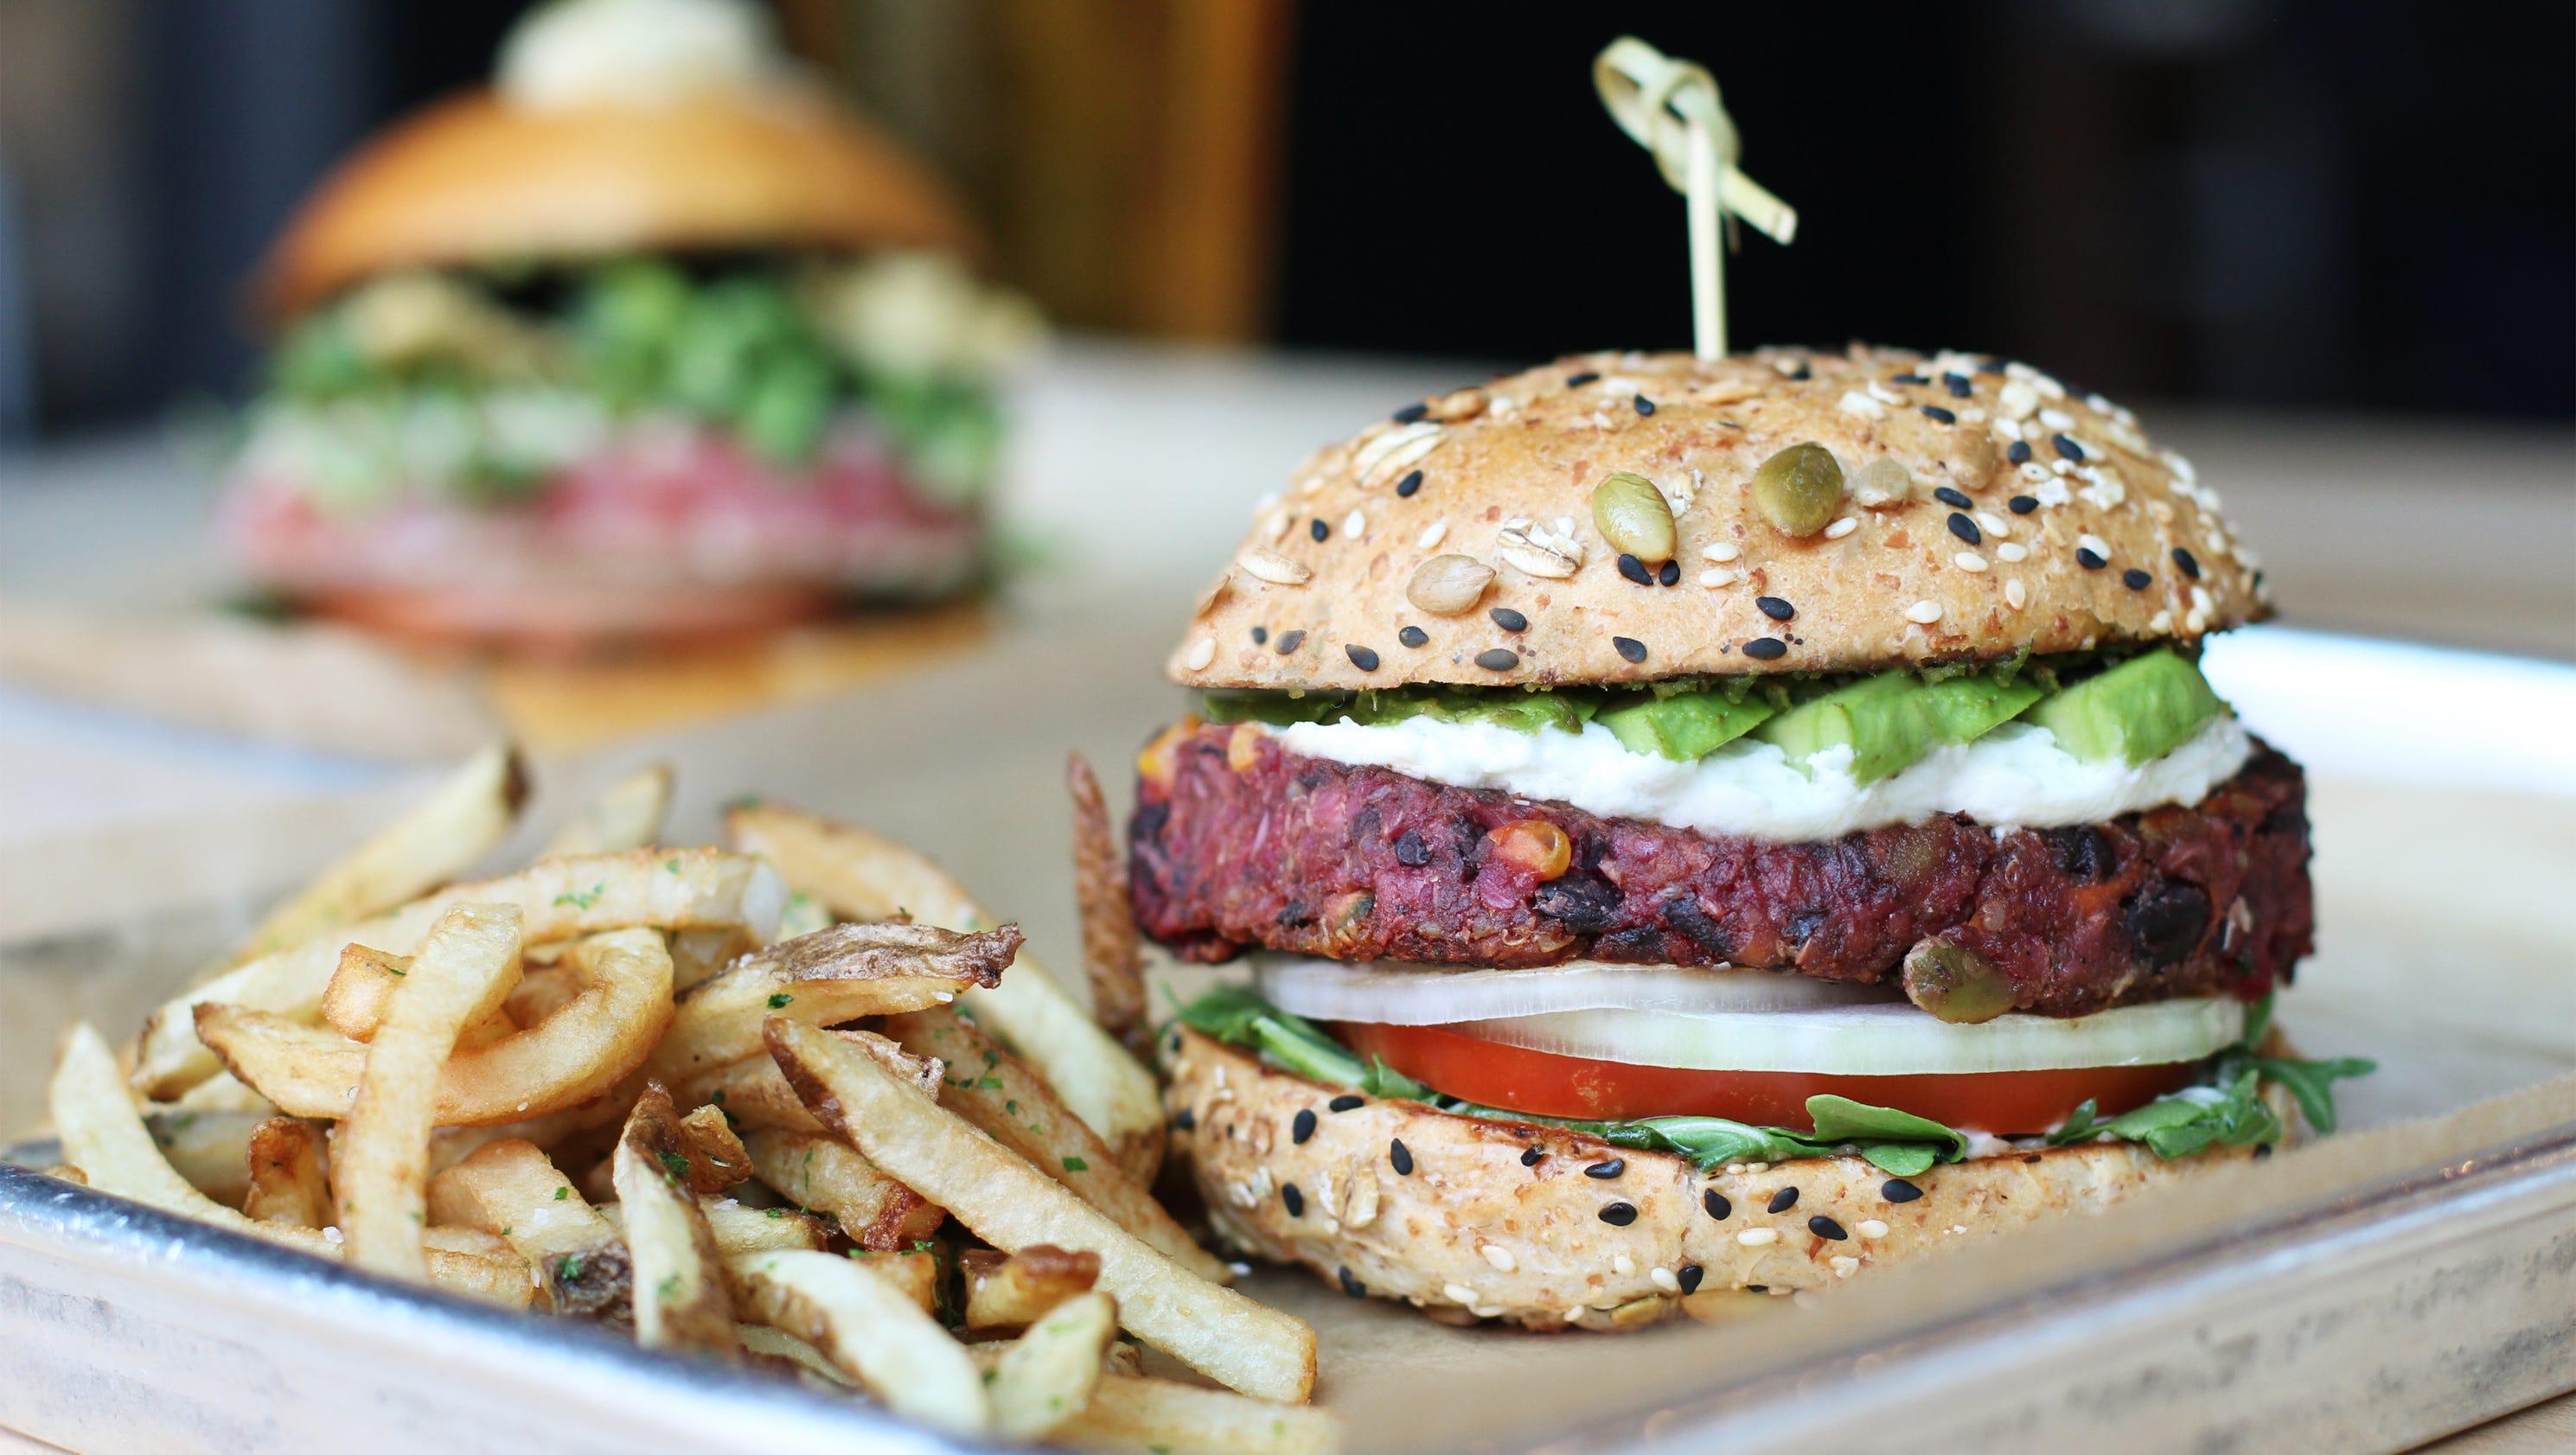 Best Fast Food Restaurants In Washington Dc